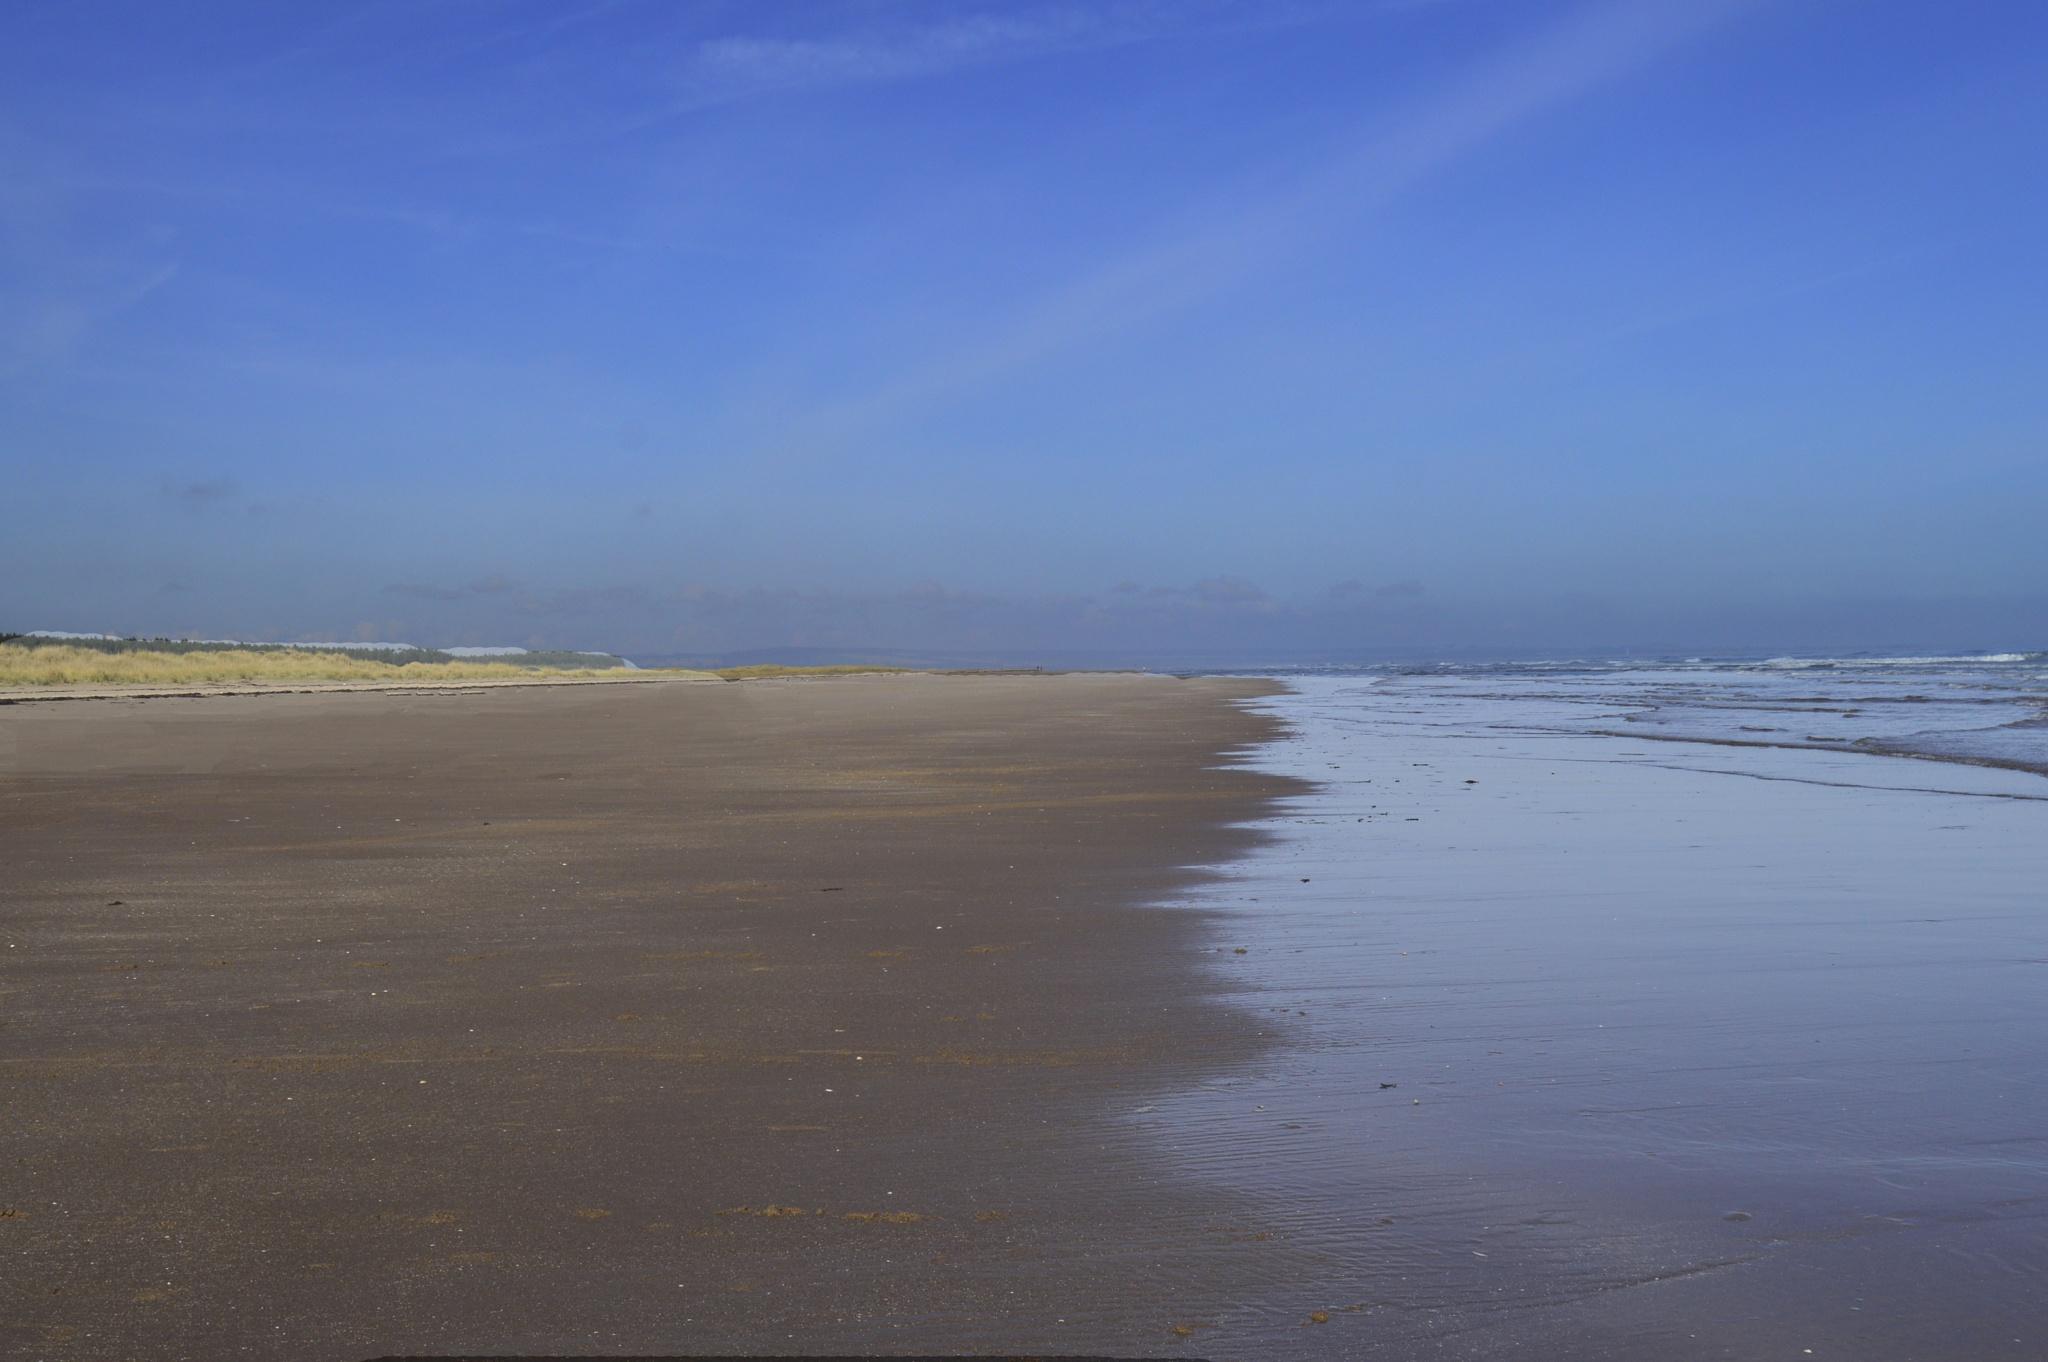 Lonely beach by John White